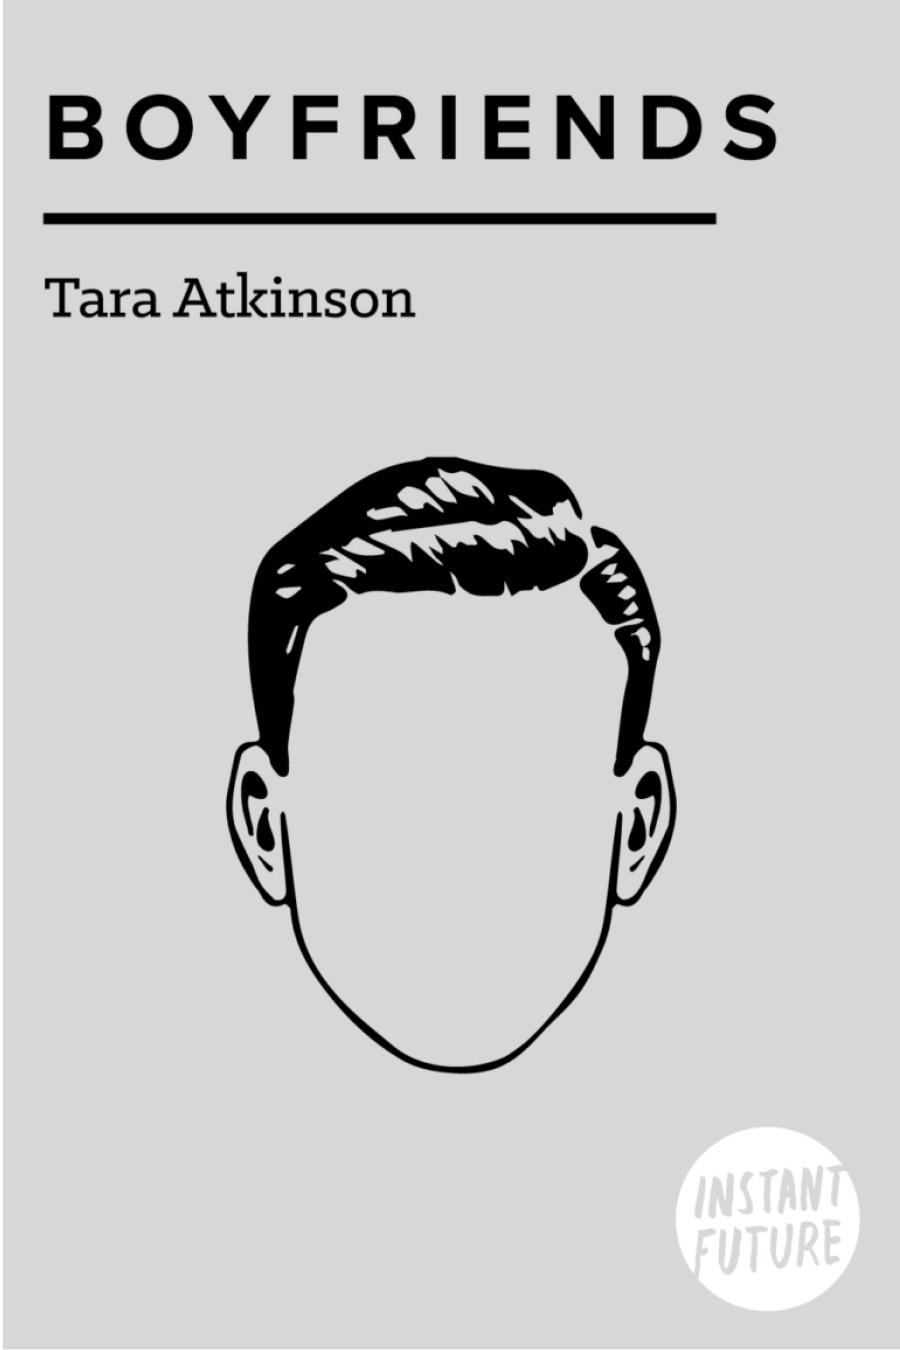 Boyfriends by Tara Atkinson